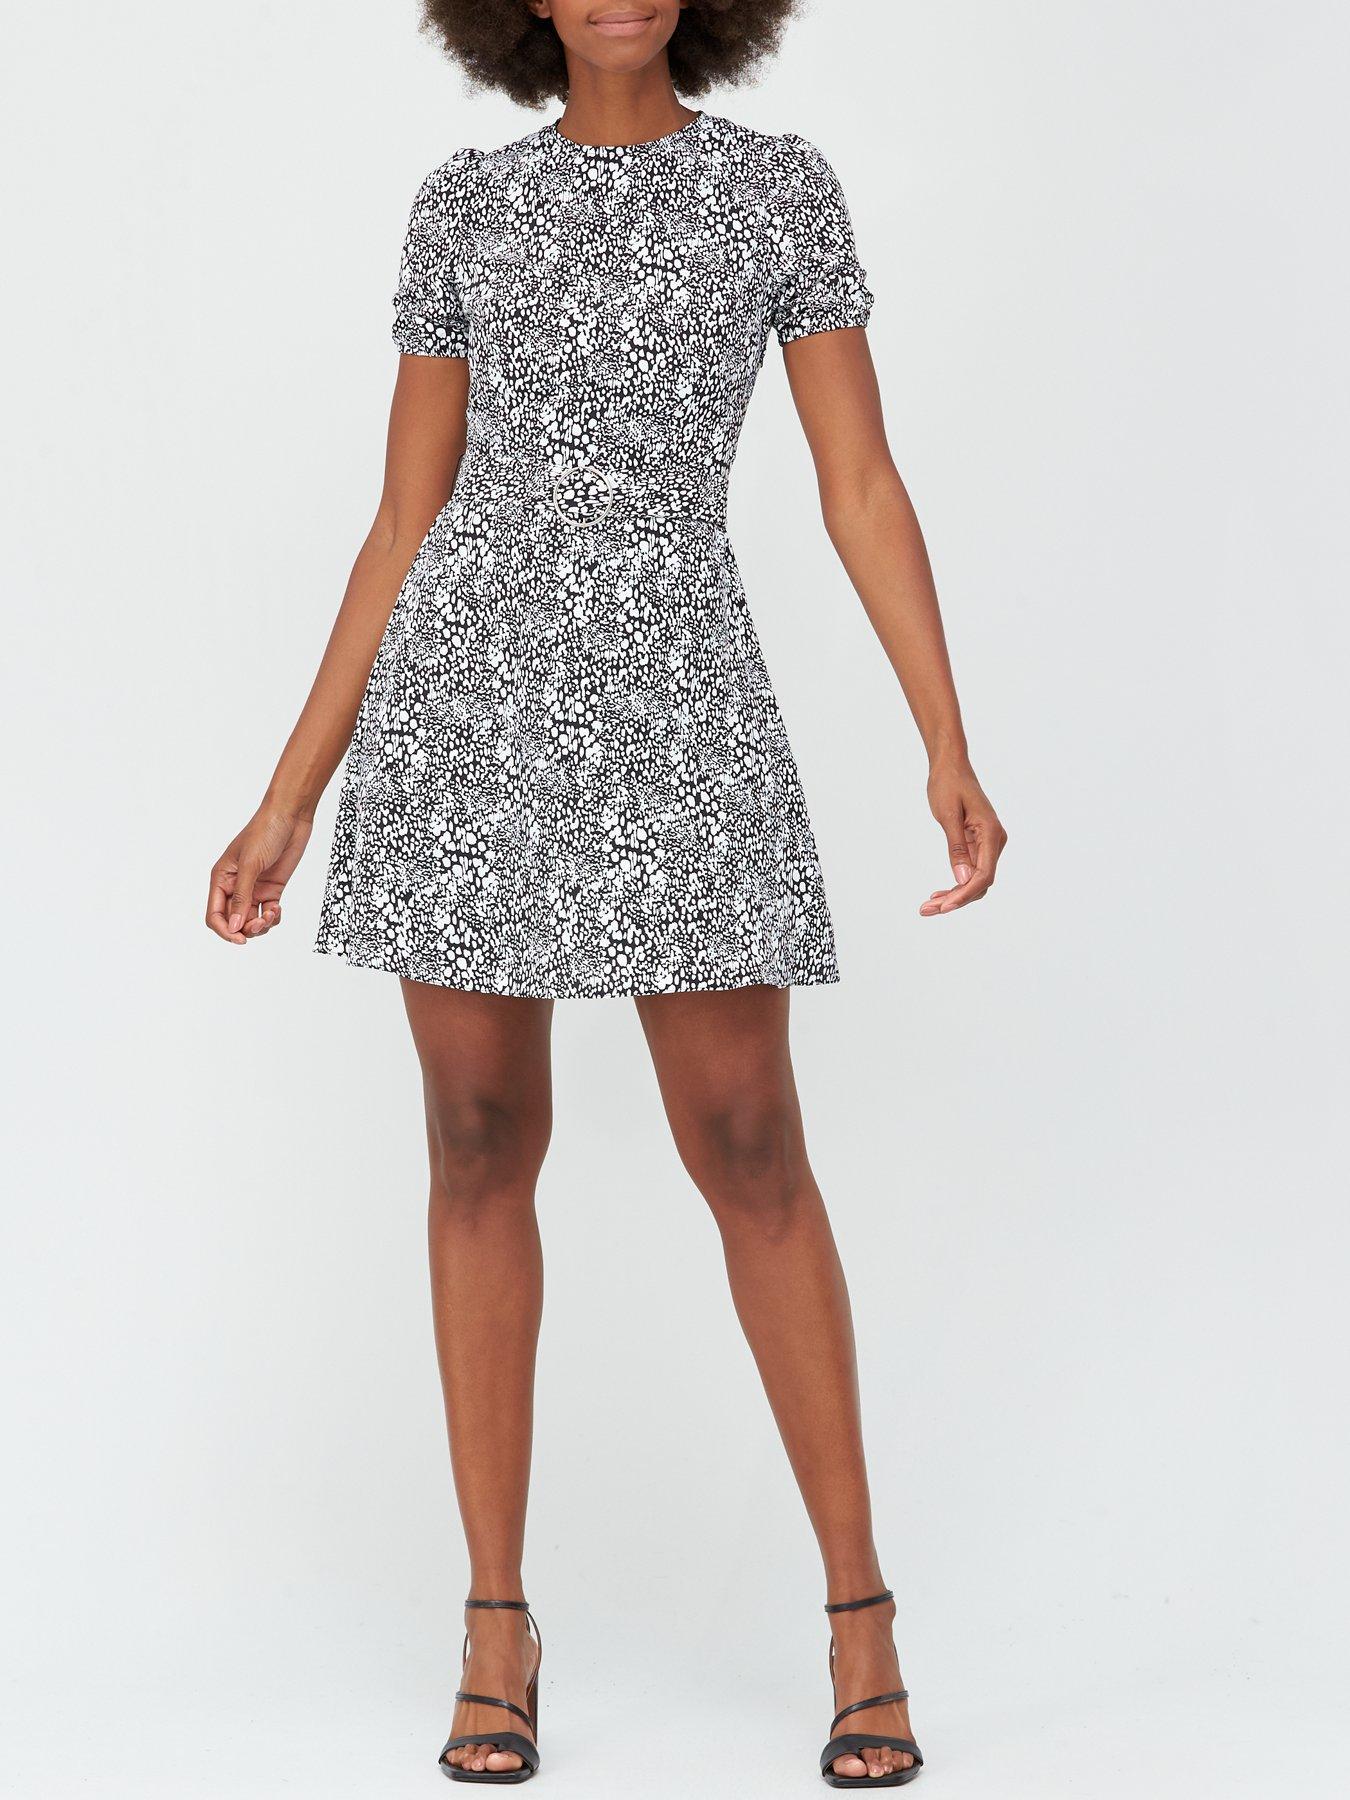 Womens Floral Printed Ladies Stretch Cap Sleeve Zip Skater Mini Dress Plus Size